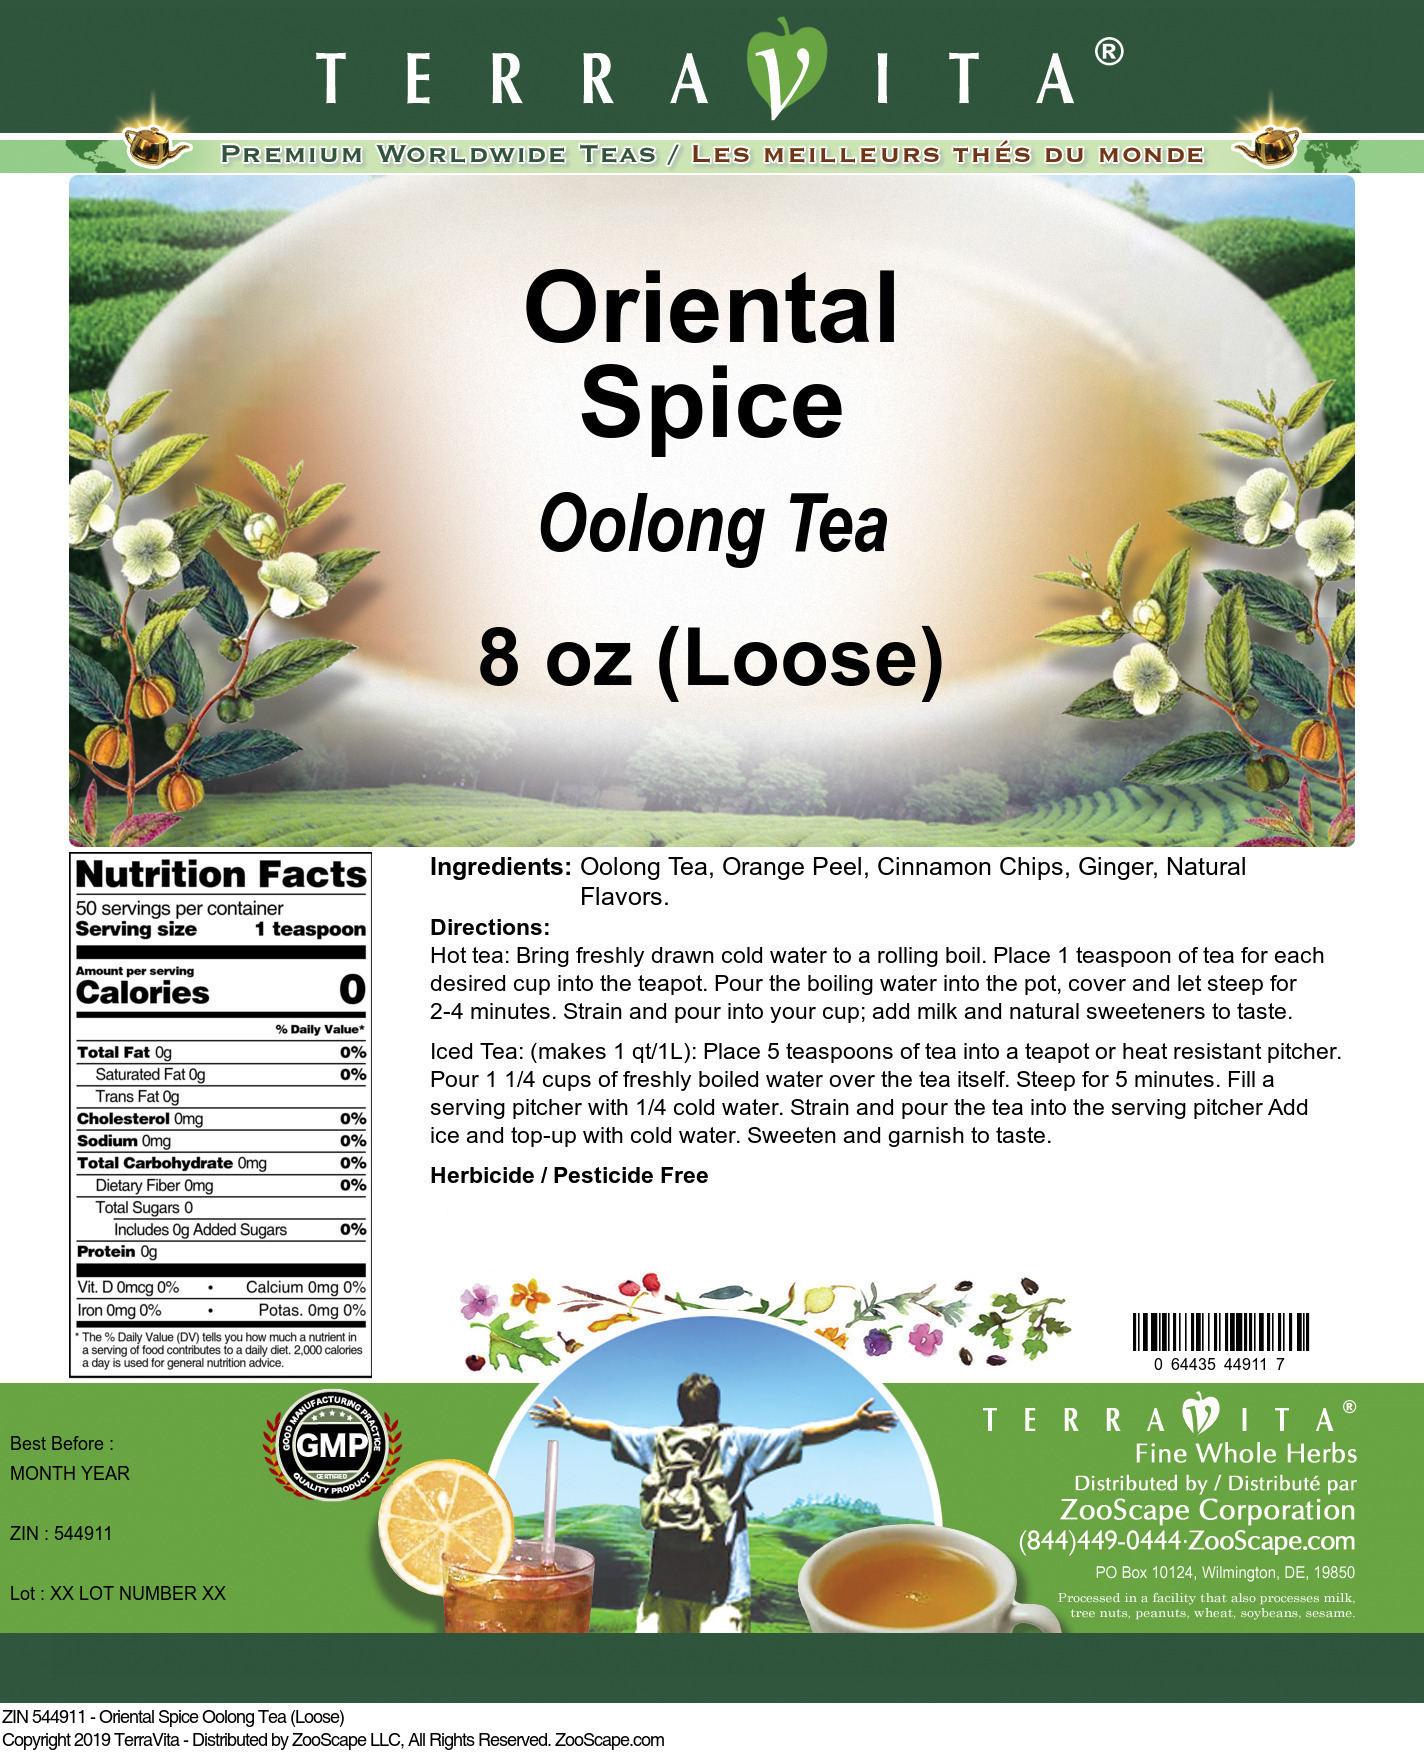 Oriental Spice Oolong Tea